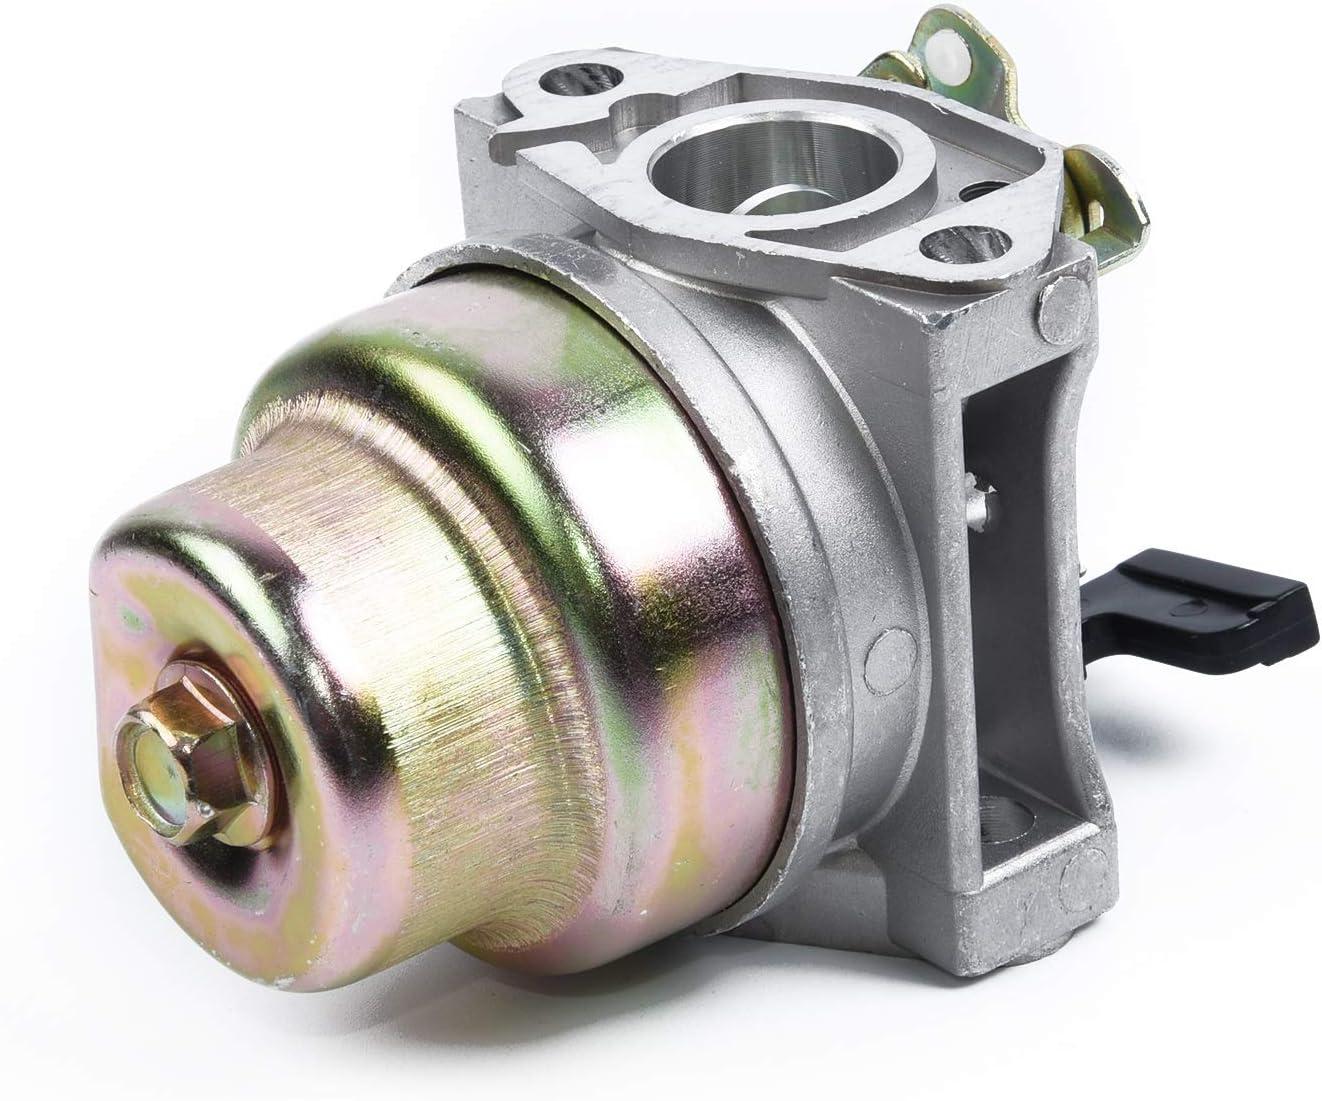 HUANHUAN Carburatore migliore per Honda G150 G200 motori 16100-883-095 16100-883-105 Carburatore Z1